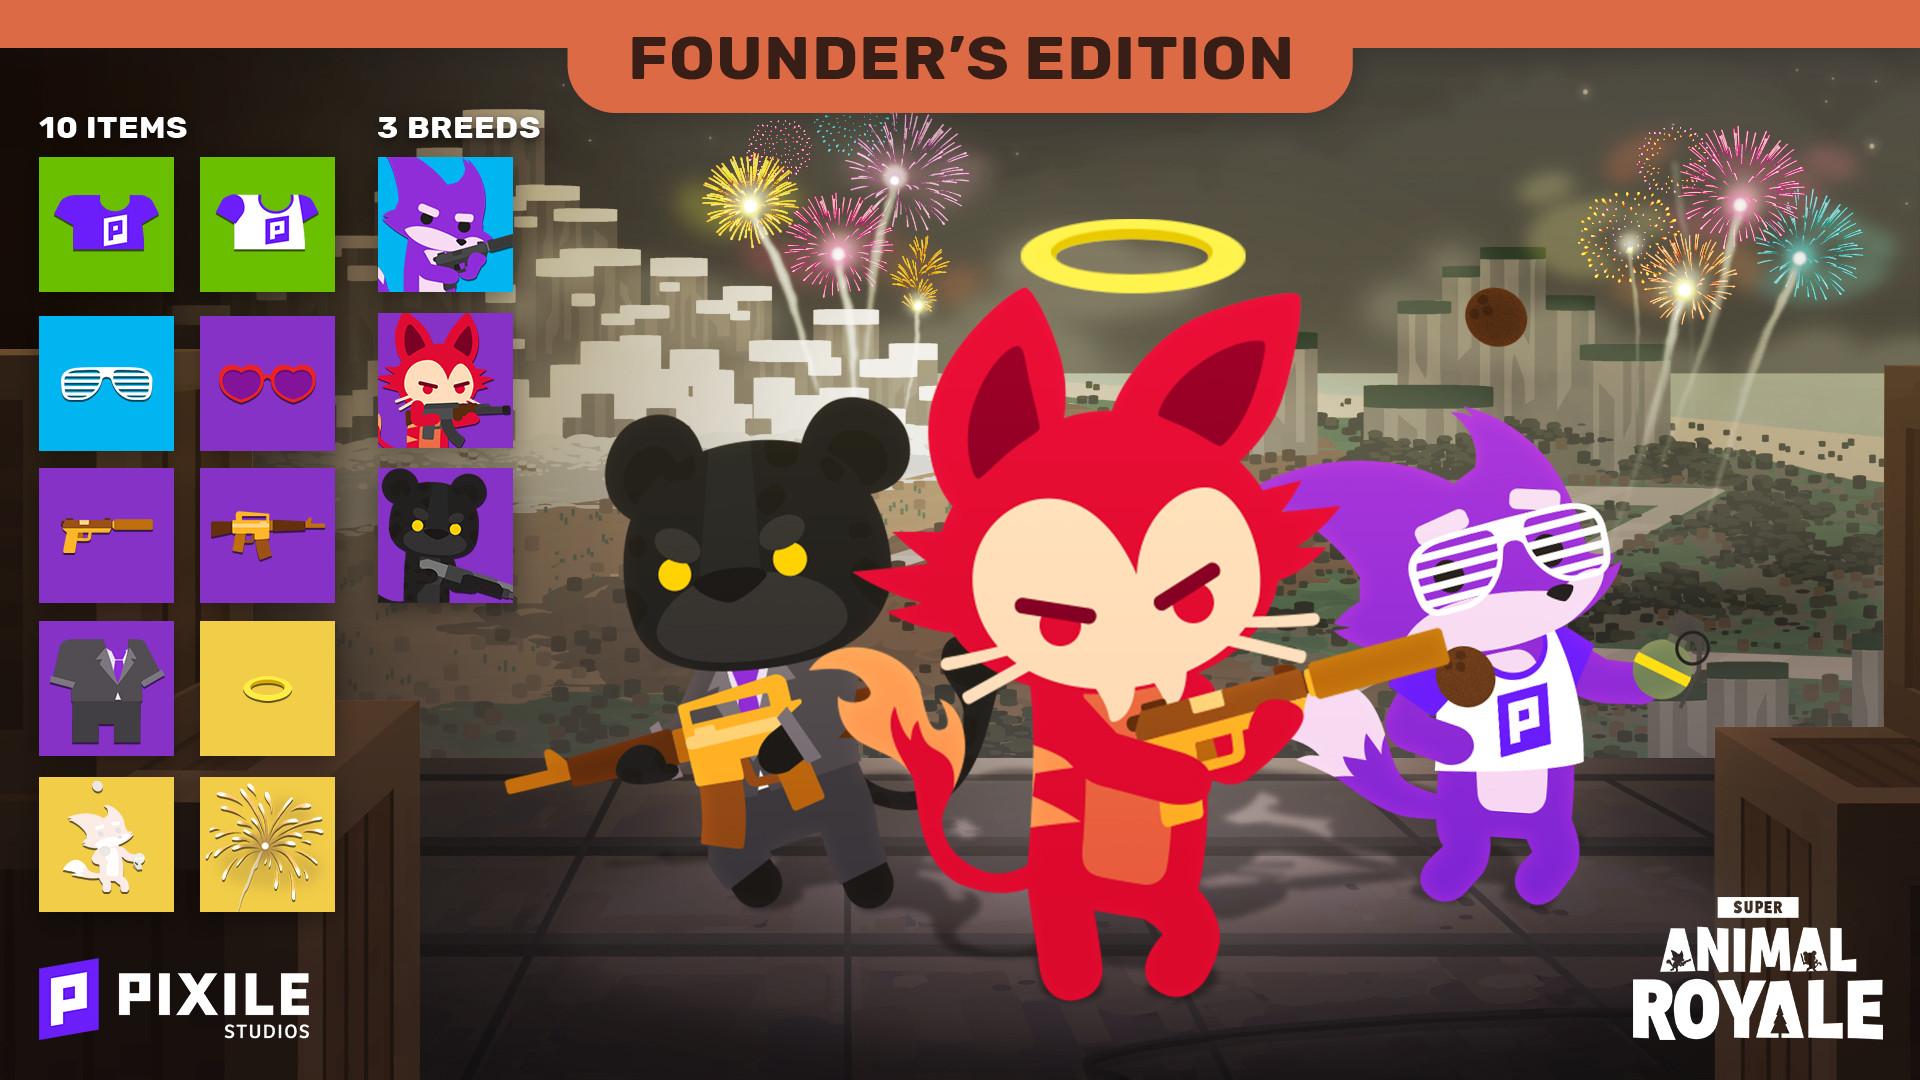 Super Animal Royale Founder's Edition PC Key Fiyatları